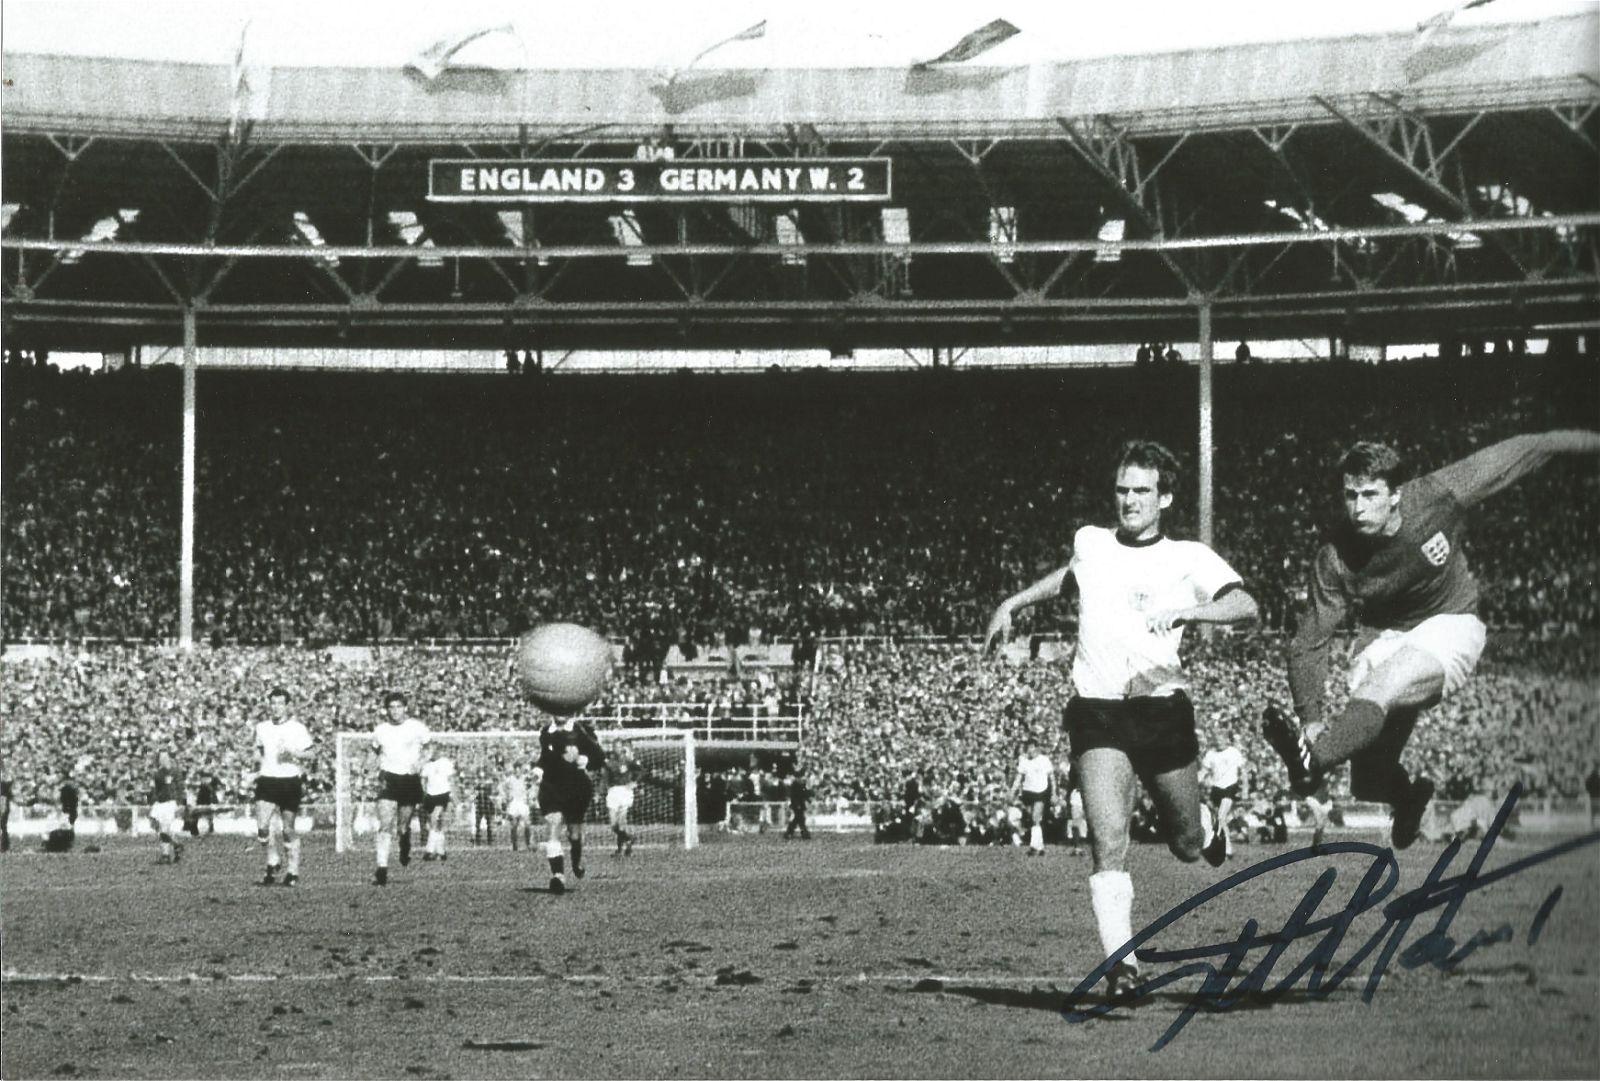 Geoff Hurst signed 10 x 8 inch b/w football photo 1966